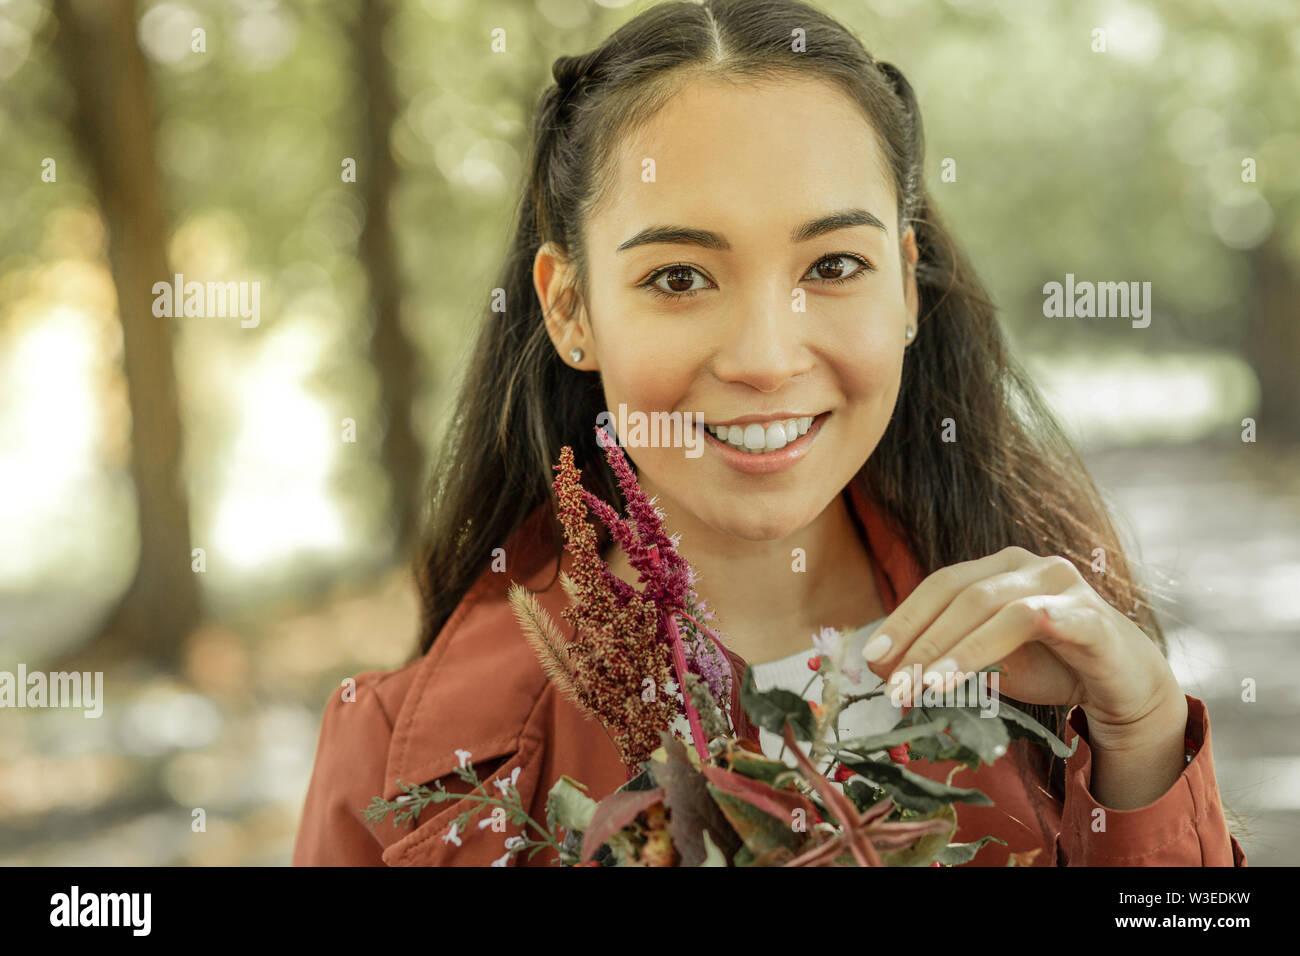 Transmission de dark-haired dame montrant sourire brillant dans l'exercice Photo Stock